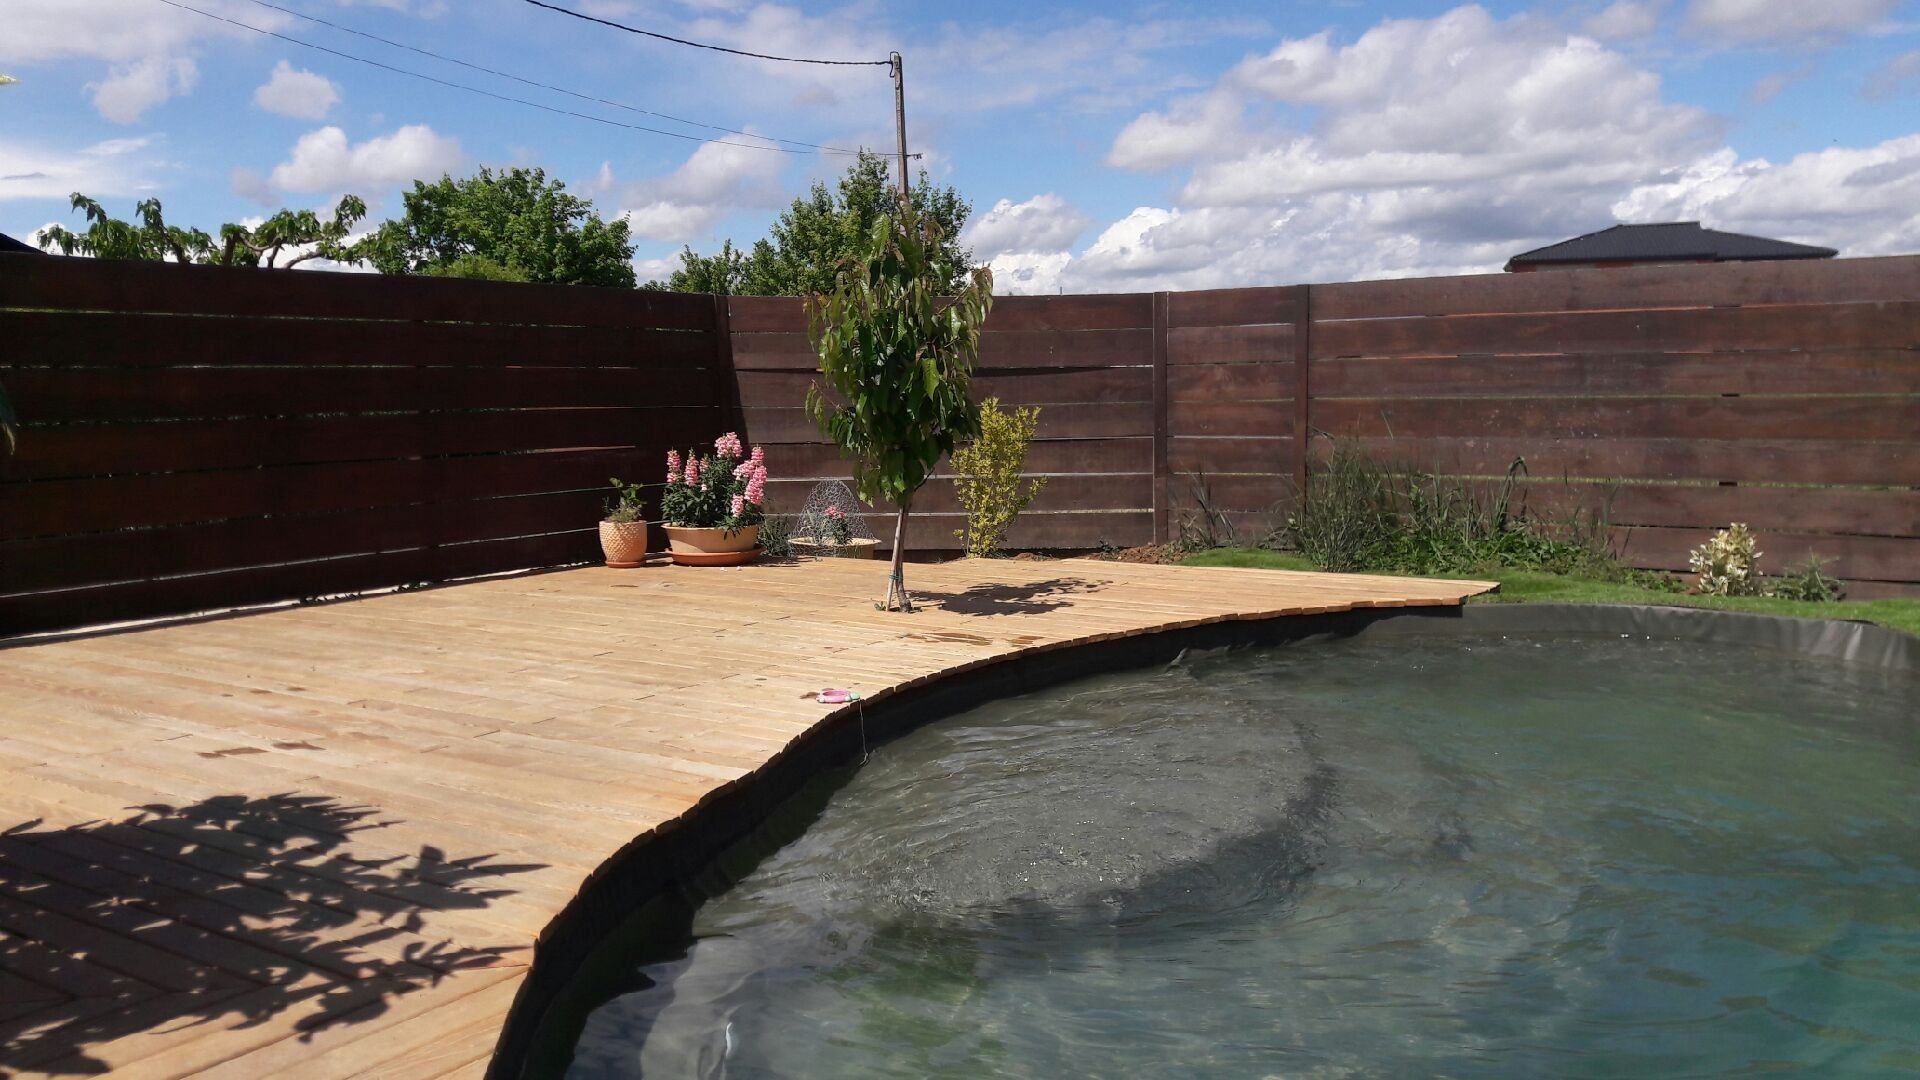 la piscine sur terre daniel liaigre